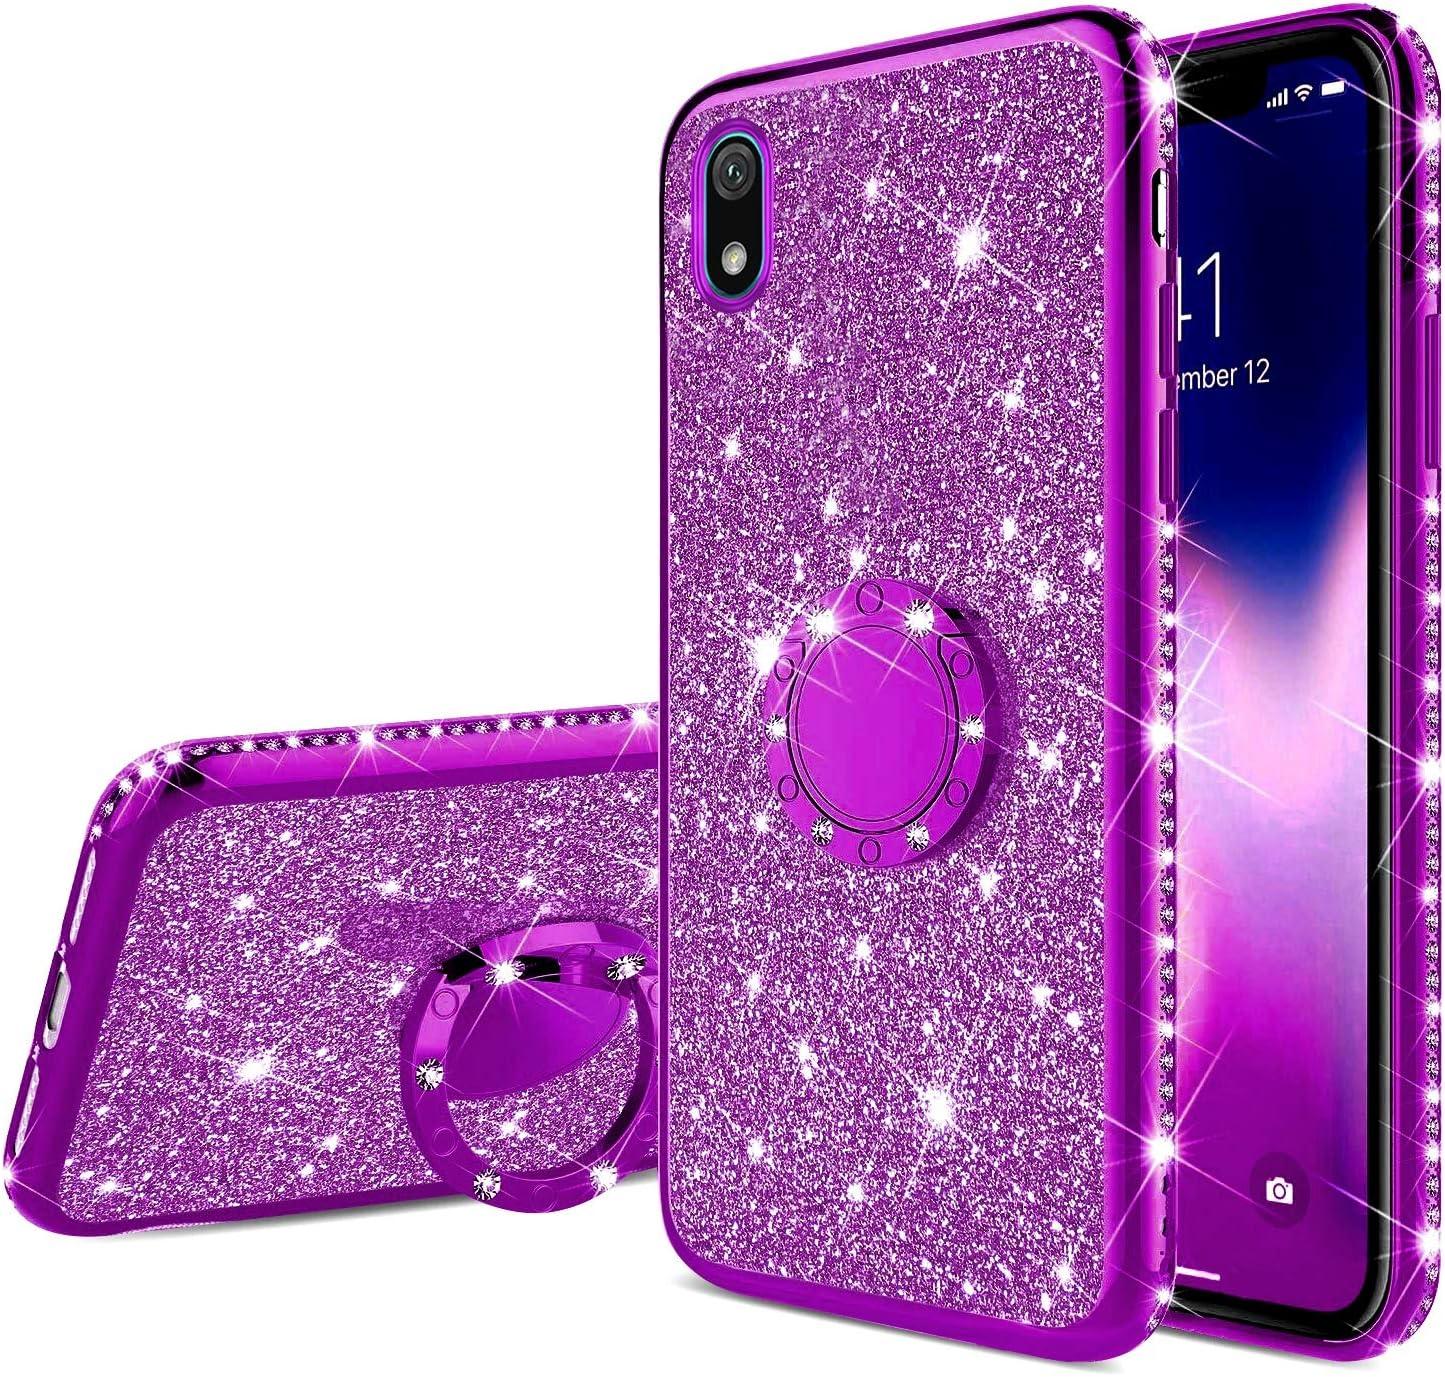 Coque Compatible avec Huawei Y5 2019 Coque Silicone Bling Gliter Paillette Brillant Luxe Strass Coque Etui Bague Support Téléphone TPU Souple ...